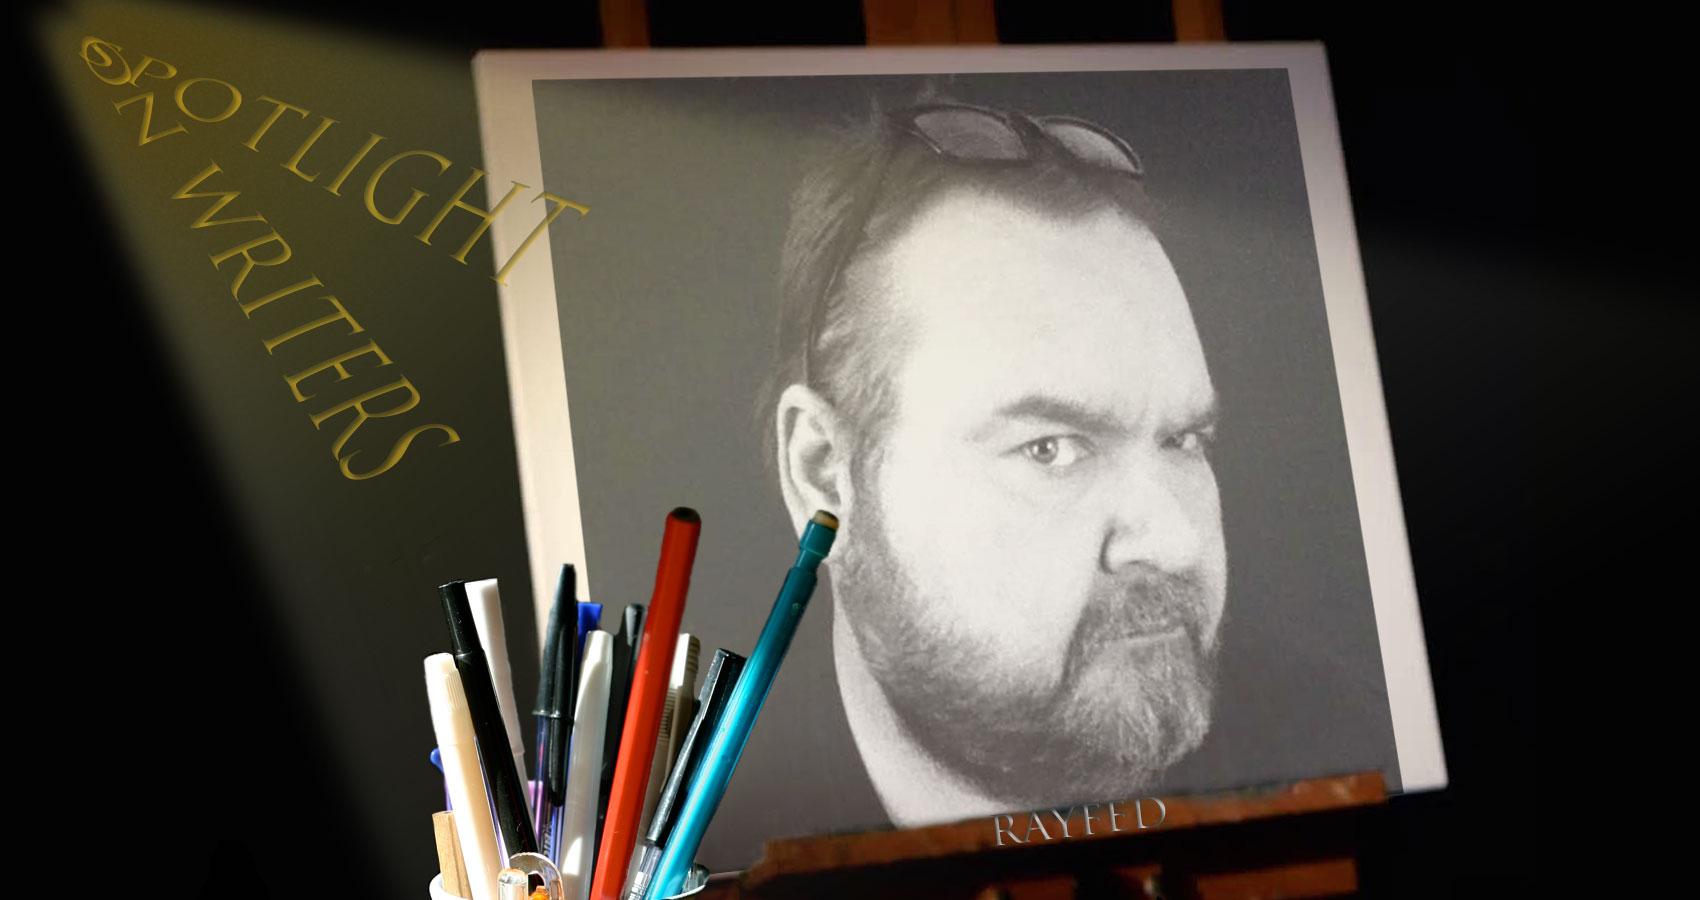 Spotlight On Writers - RayFed at Spillwords.com